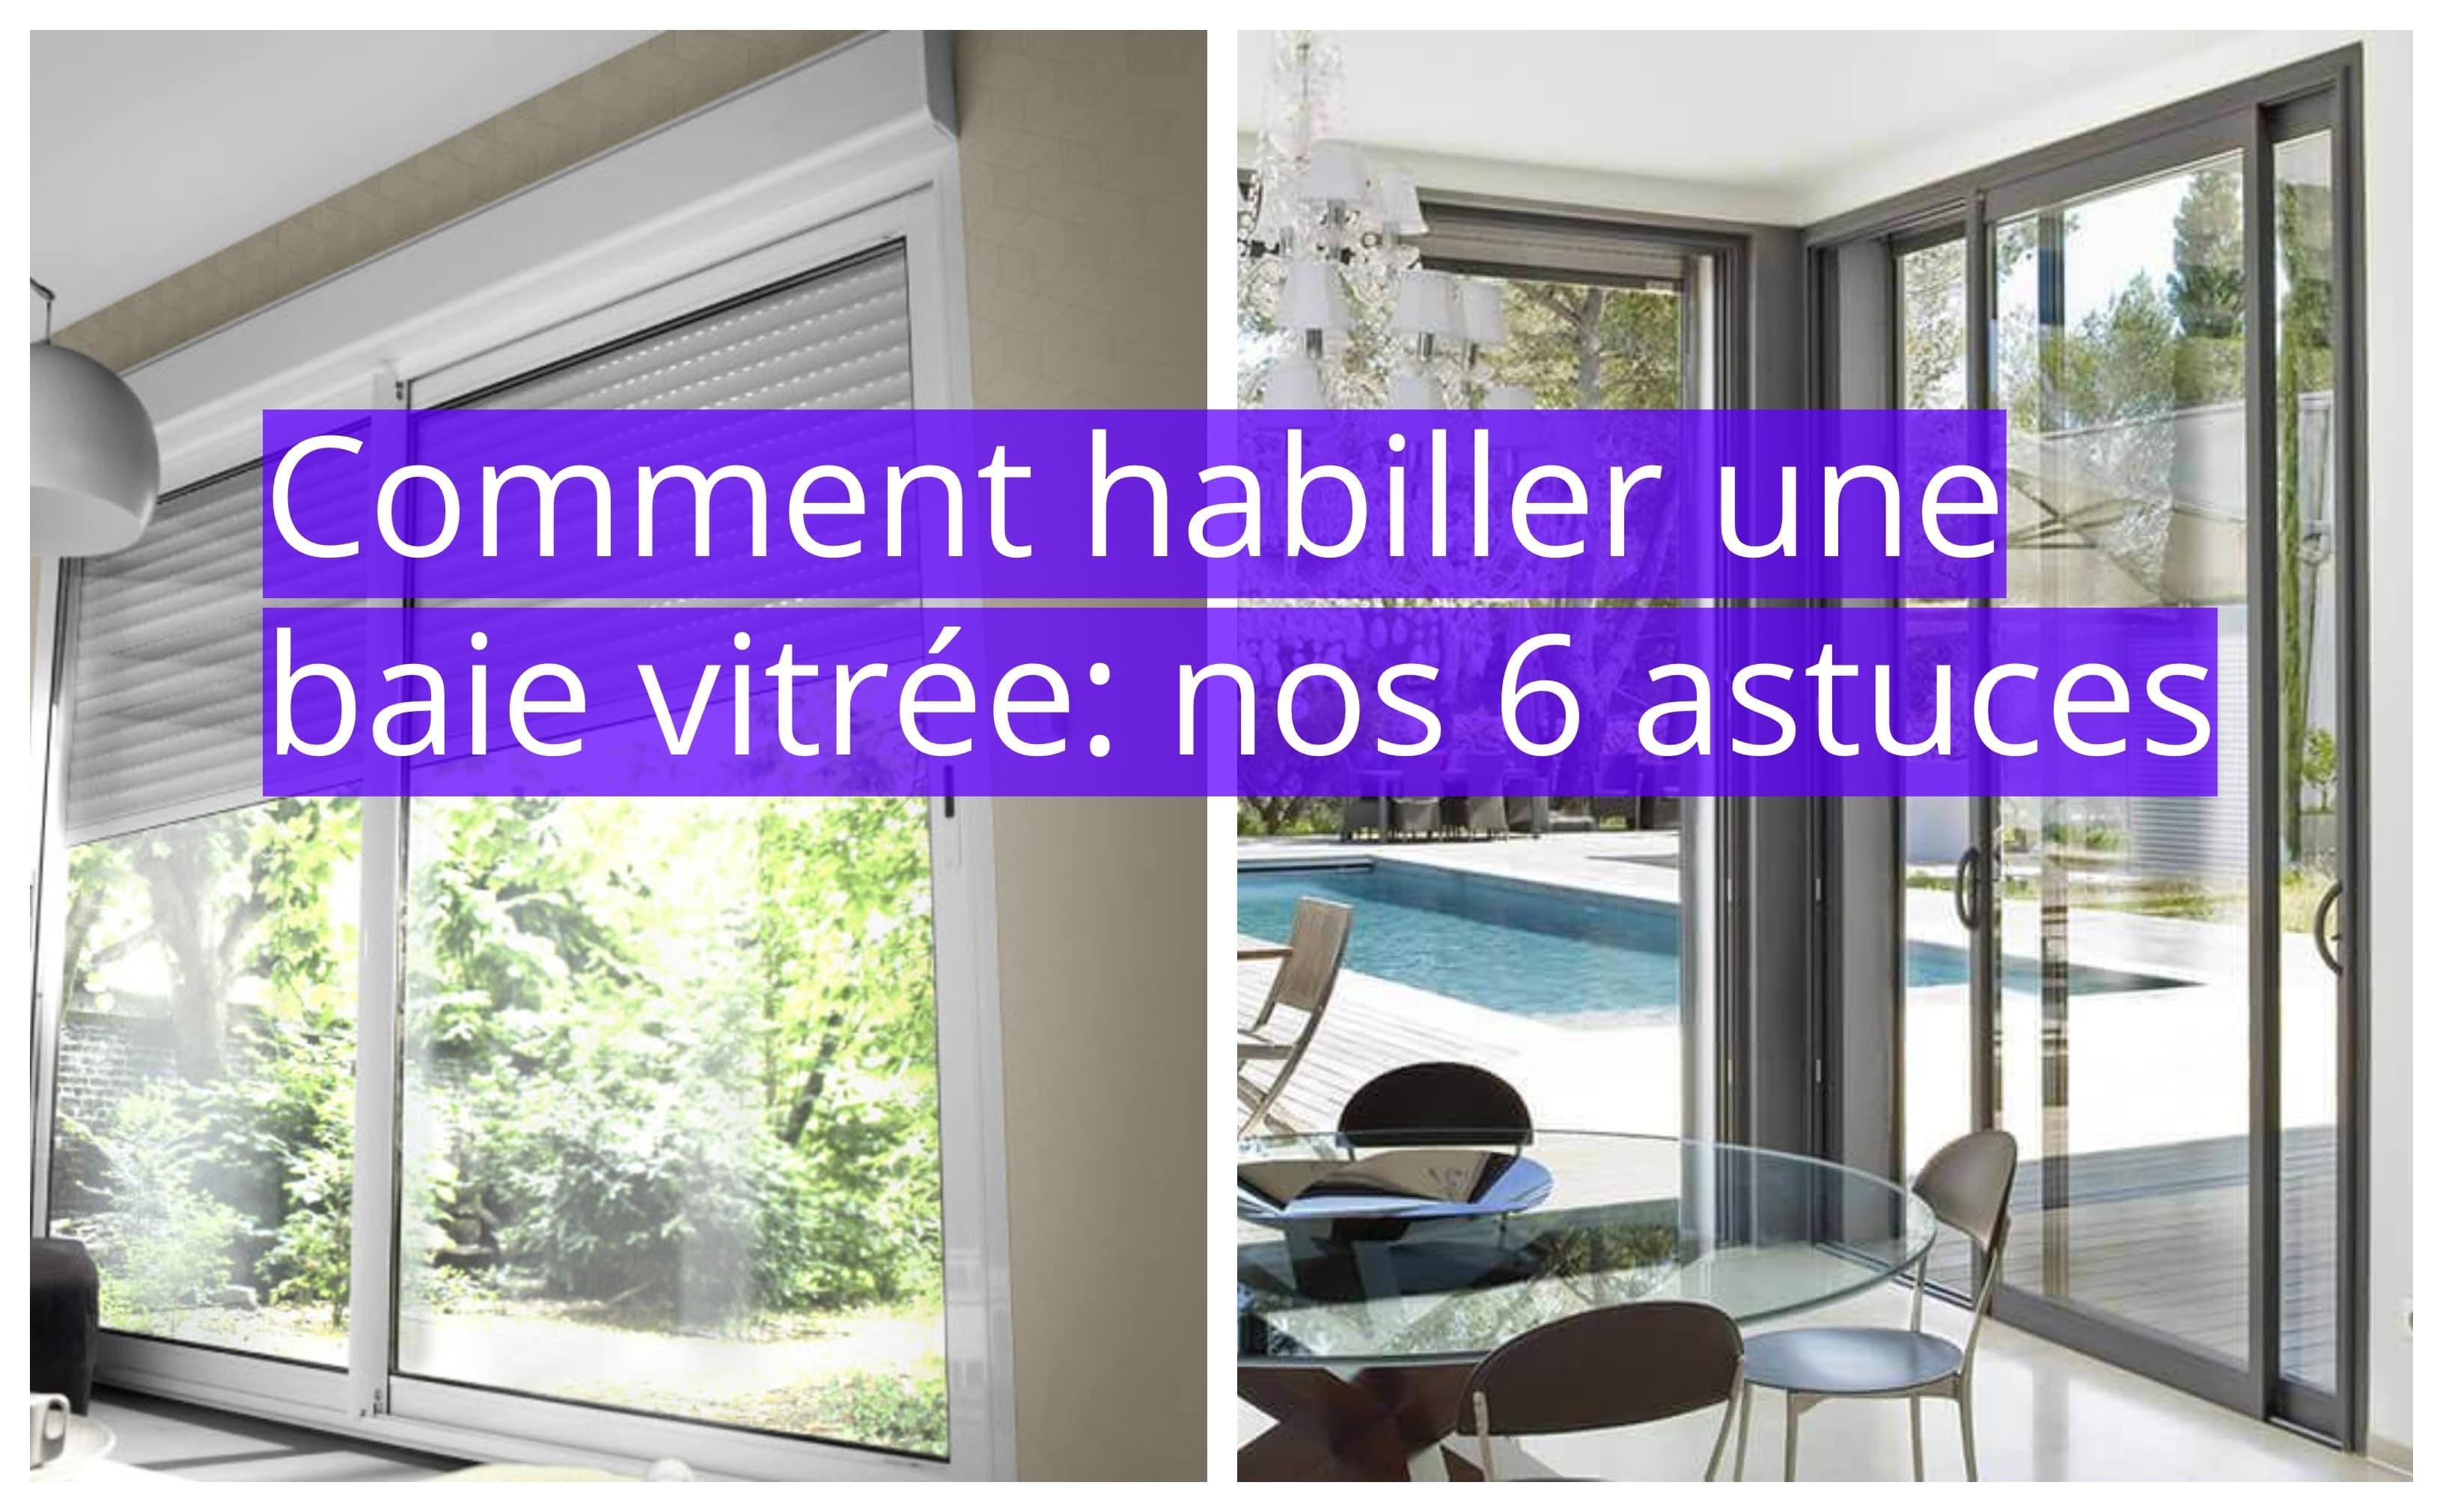 Habillage baie vitr e noel decoration Rideaux baie vitree moderne